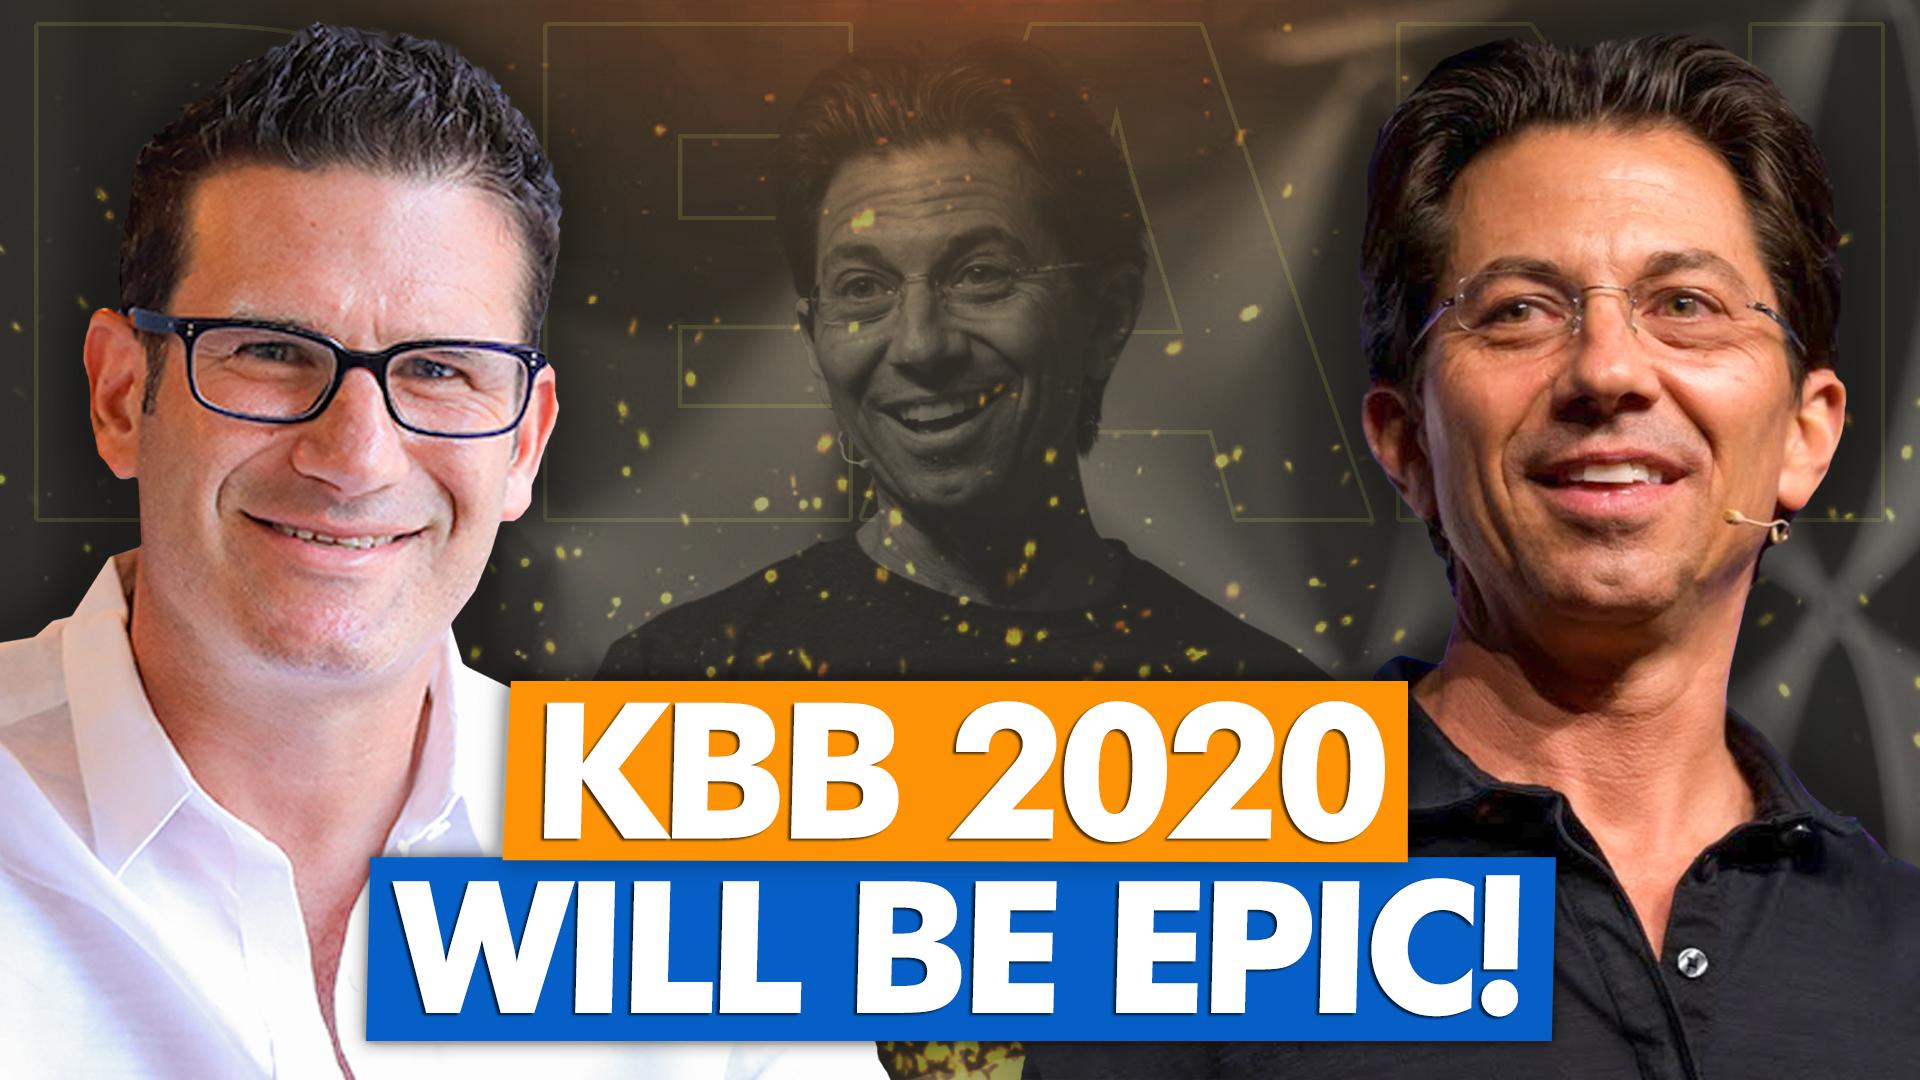 kbb 2020 dean graziosi